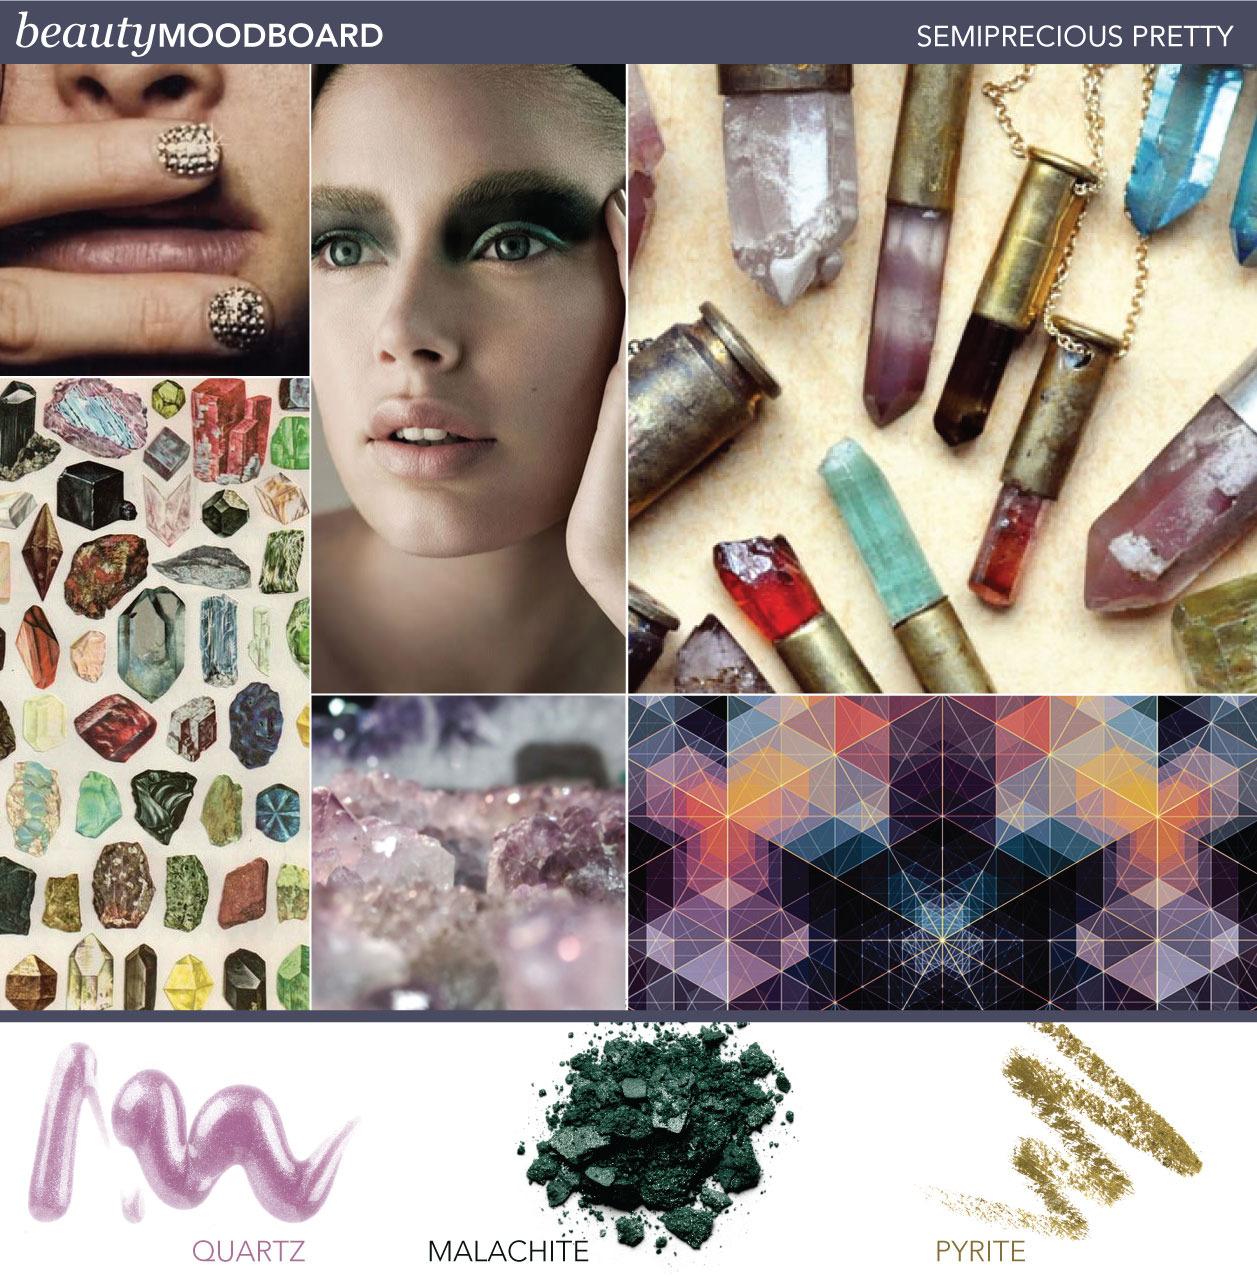 Beauty Mood Board Semiprecious Pretty Beautylish